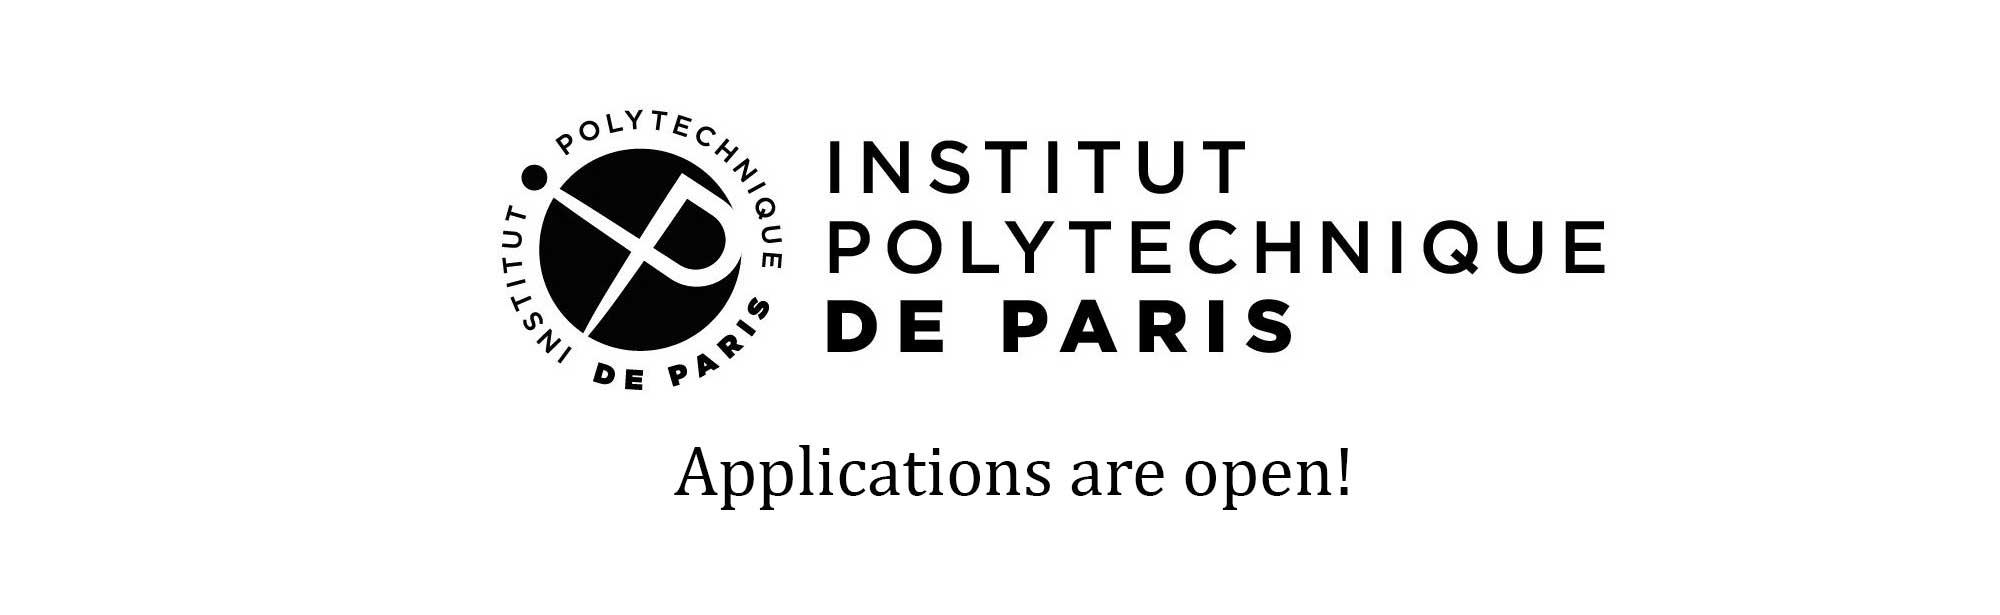 https://programmes.polytechnique.edu/sites/default/files/revslider/image/ipparisbonne-version.jpg